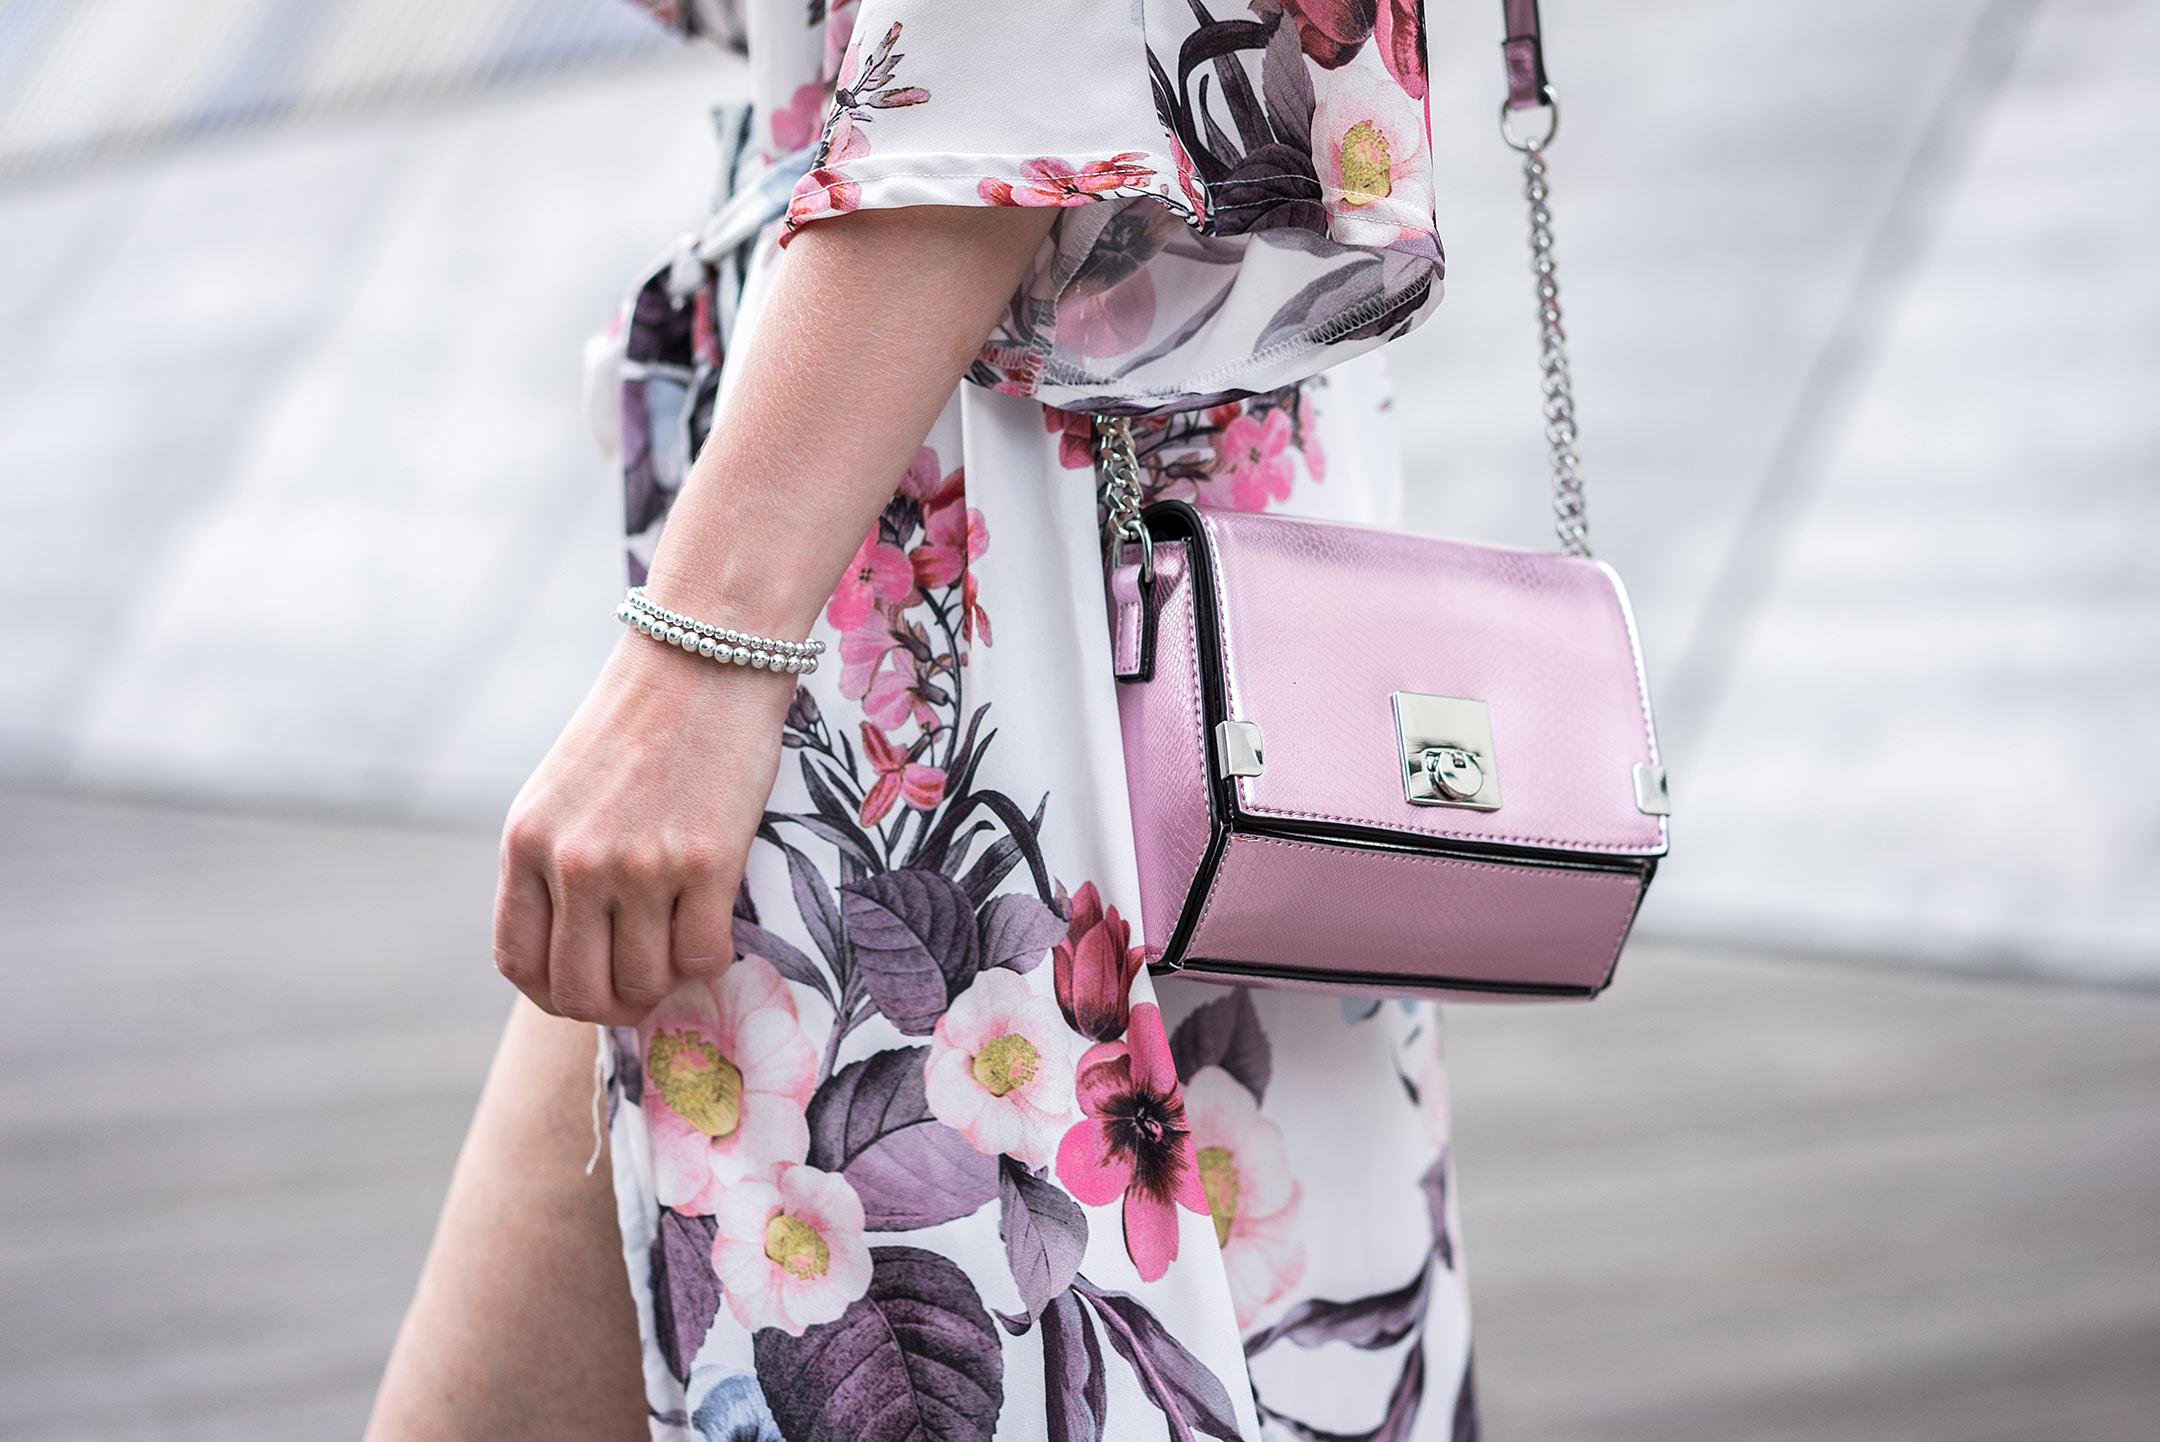 Tasche pink metallic Fashionblog Düsseldorf Sunnyinga